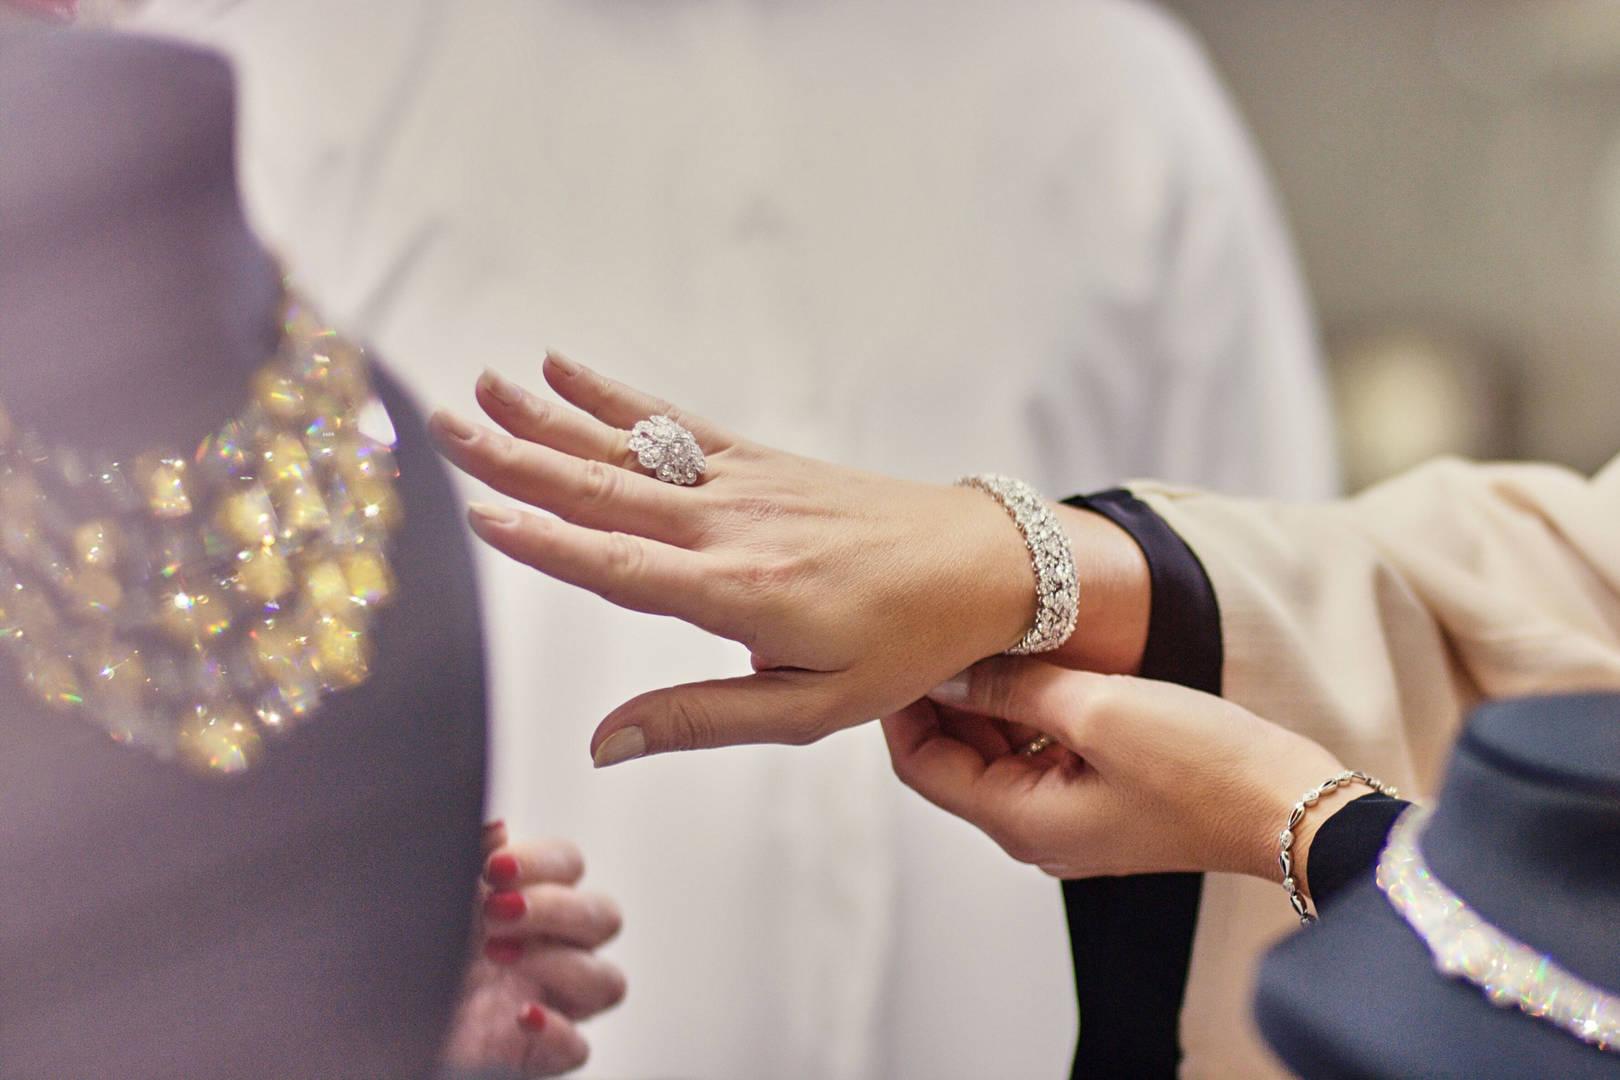 Where to buy jewellery in Dubai| Jumeirah